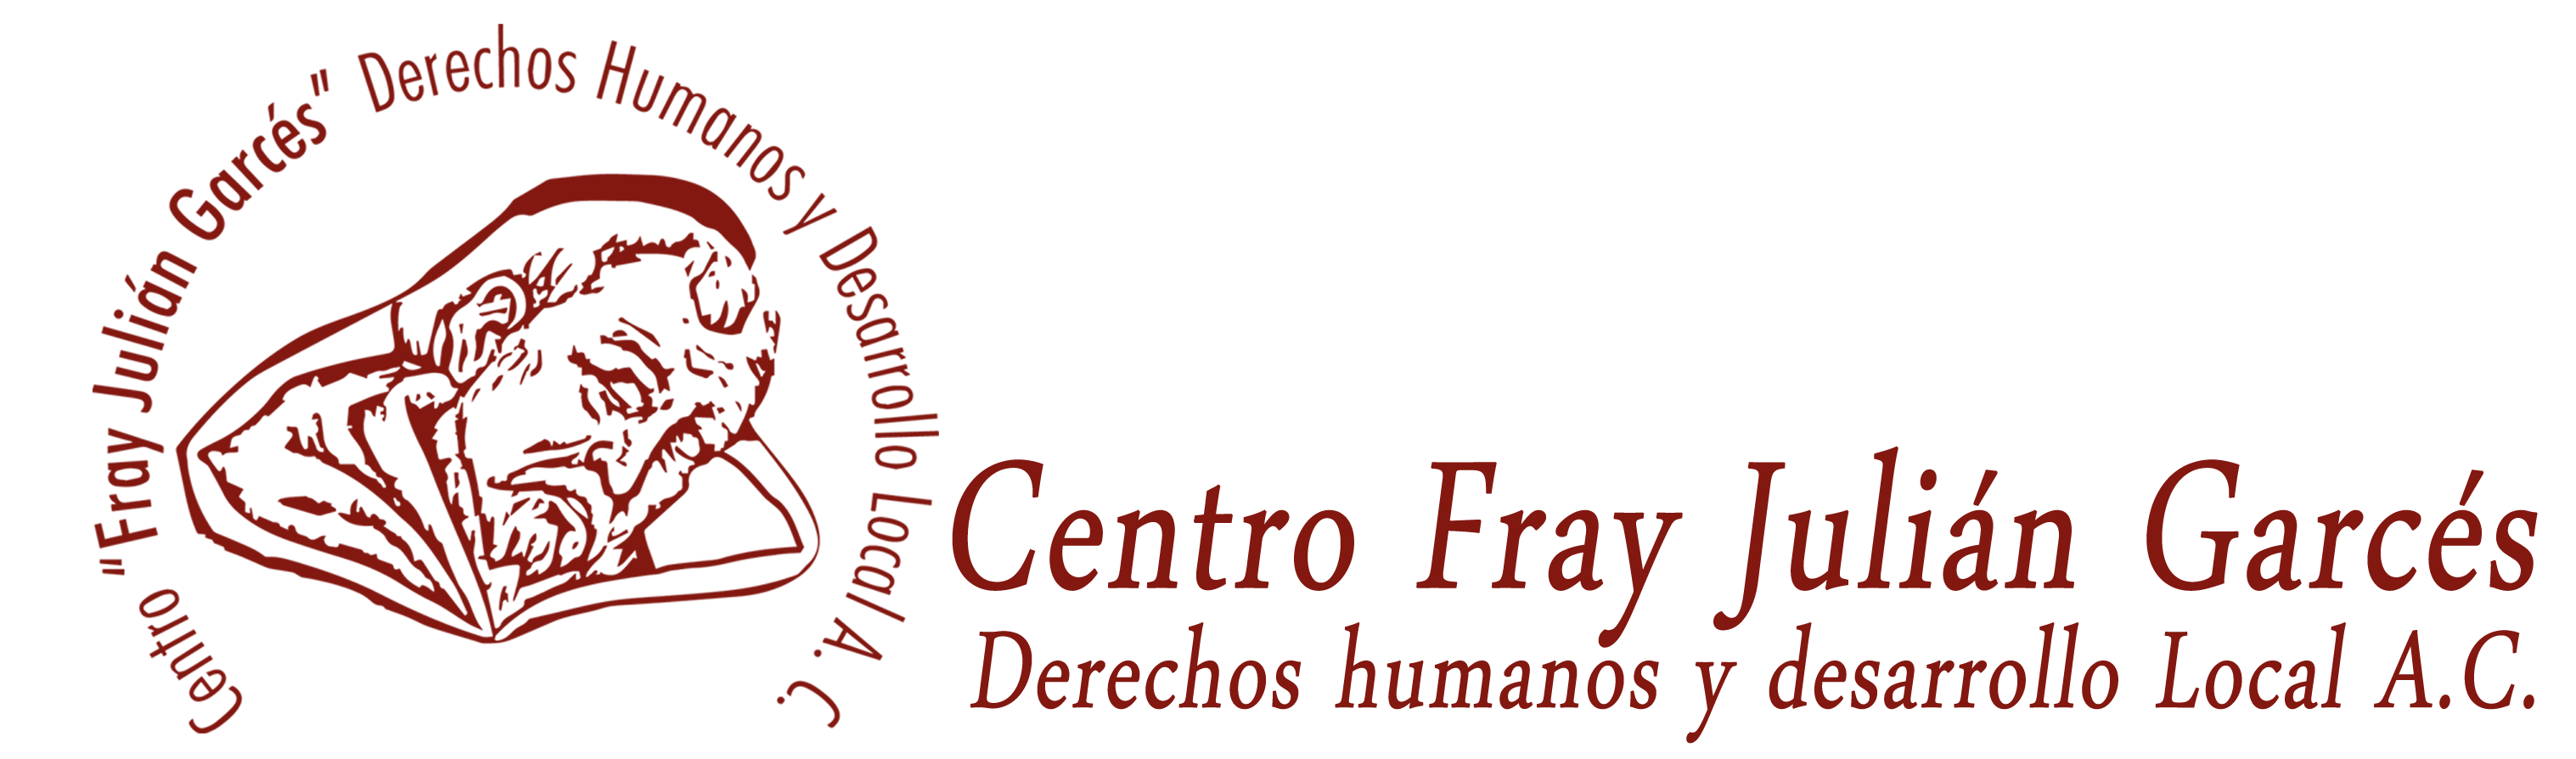 Centro Fray Julián Garcés